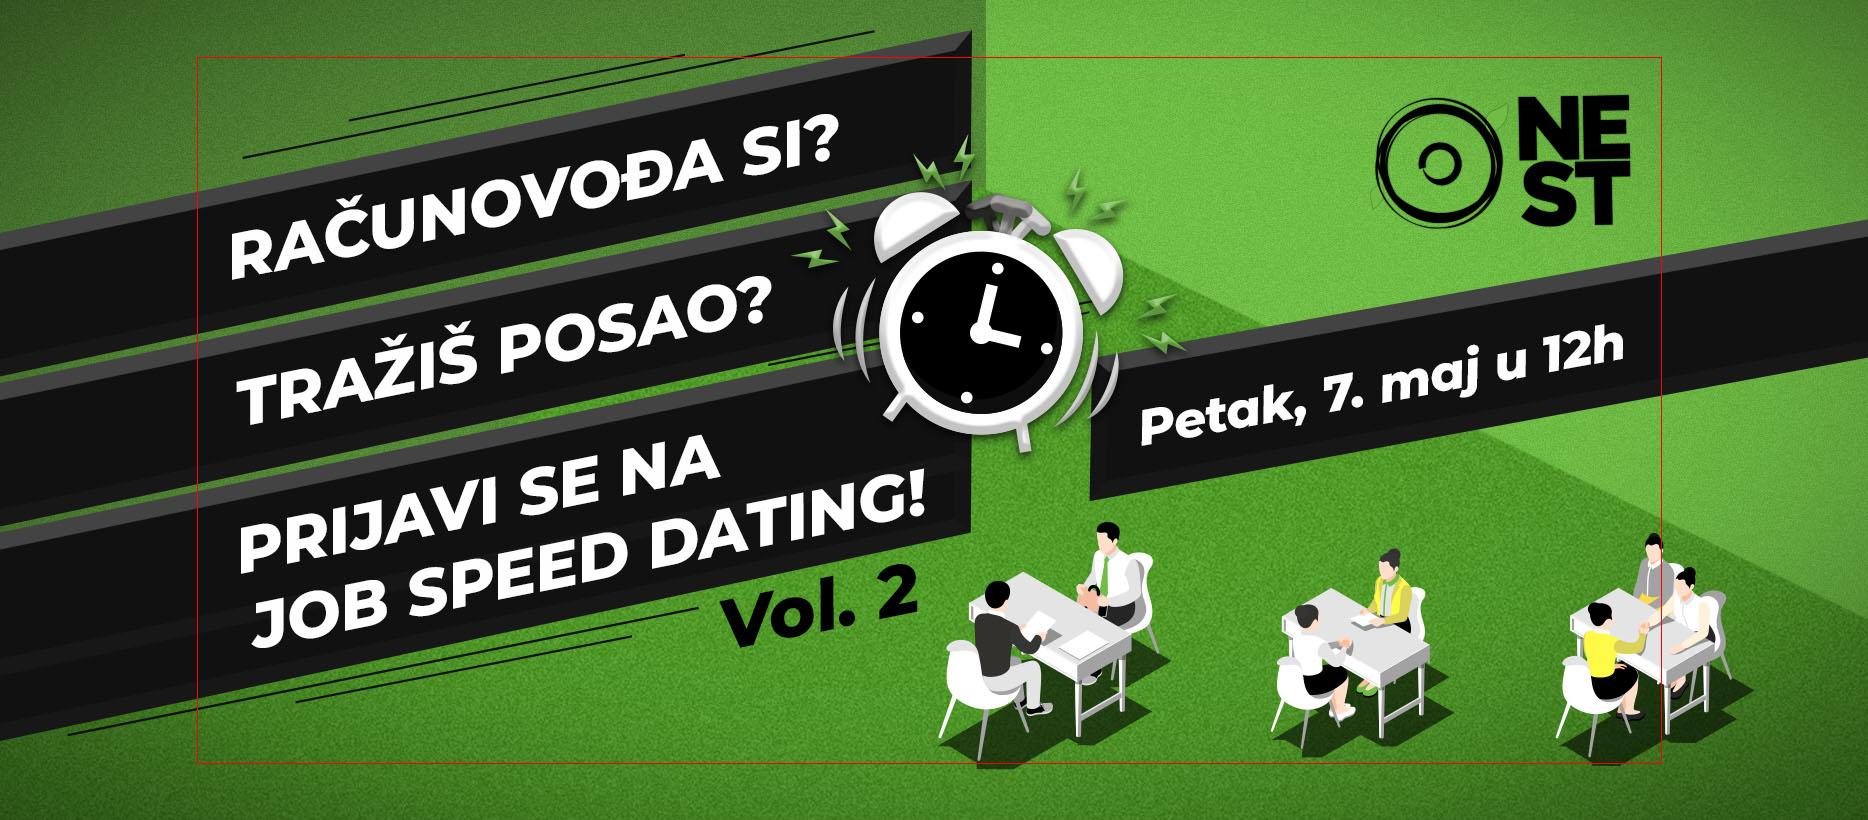 JOB SPEED DATING VOL. 2 U PODGORICI